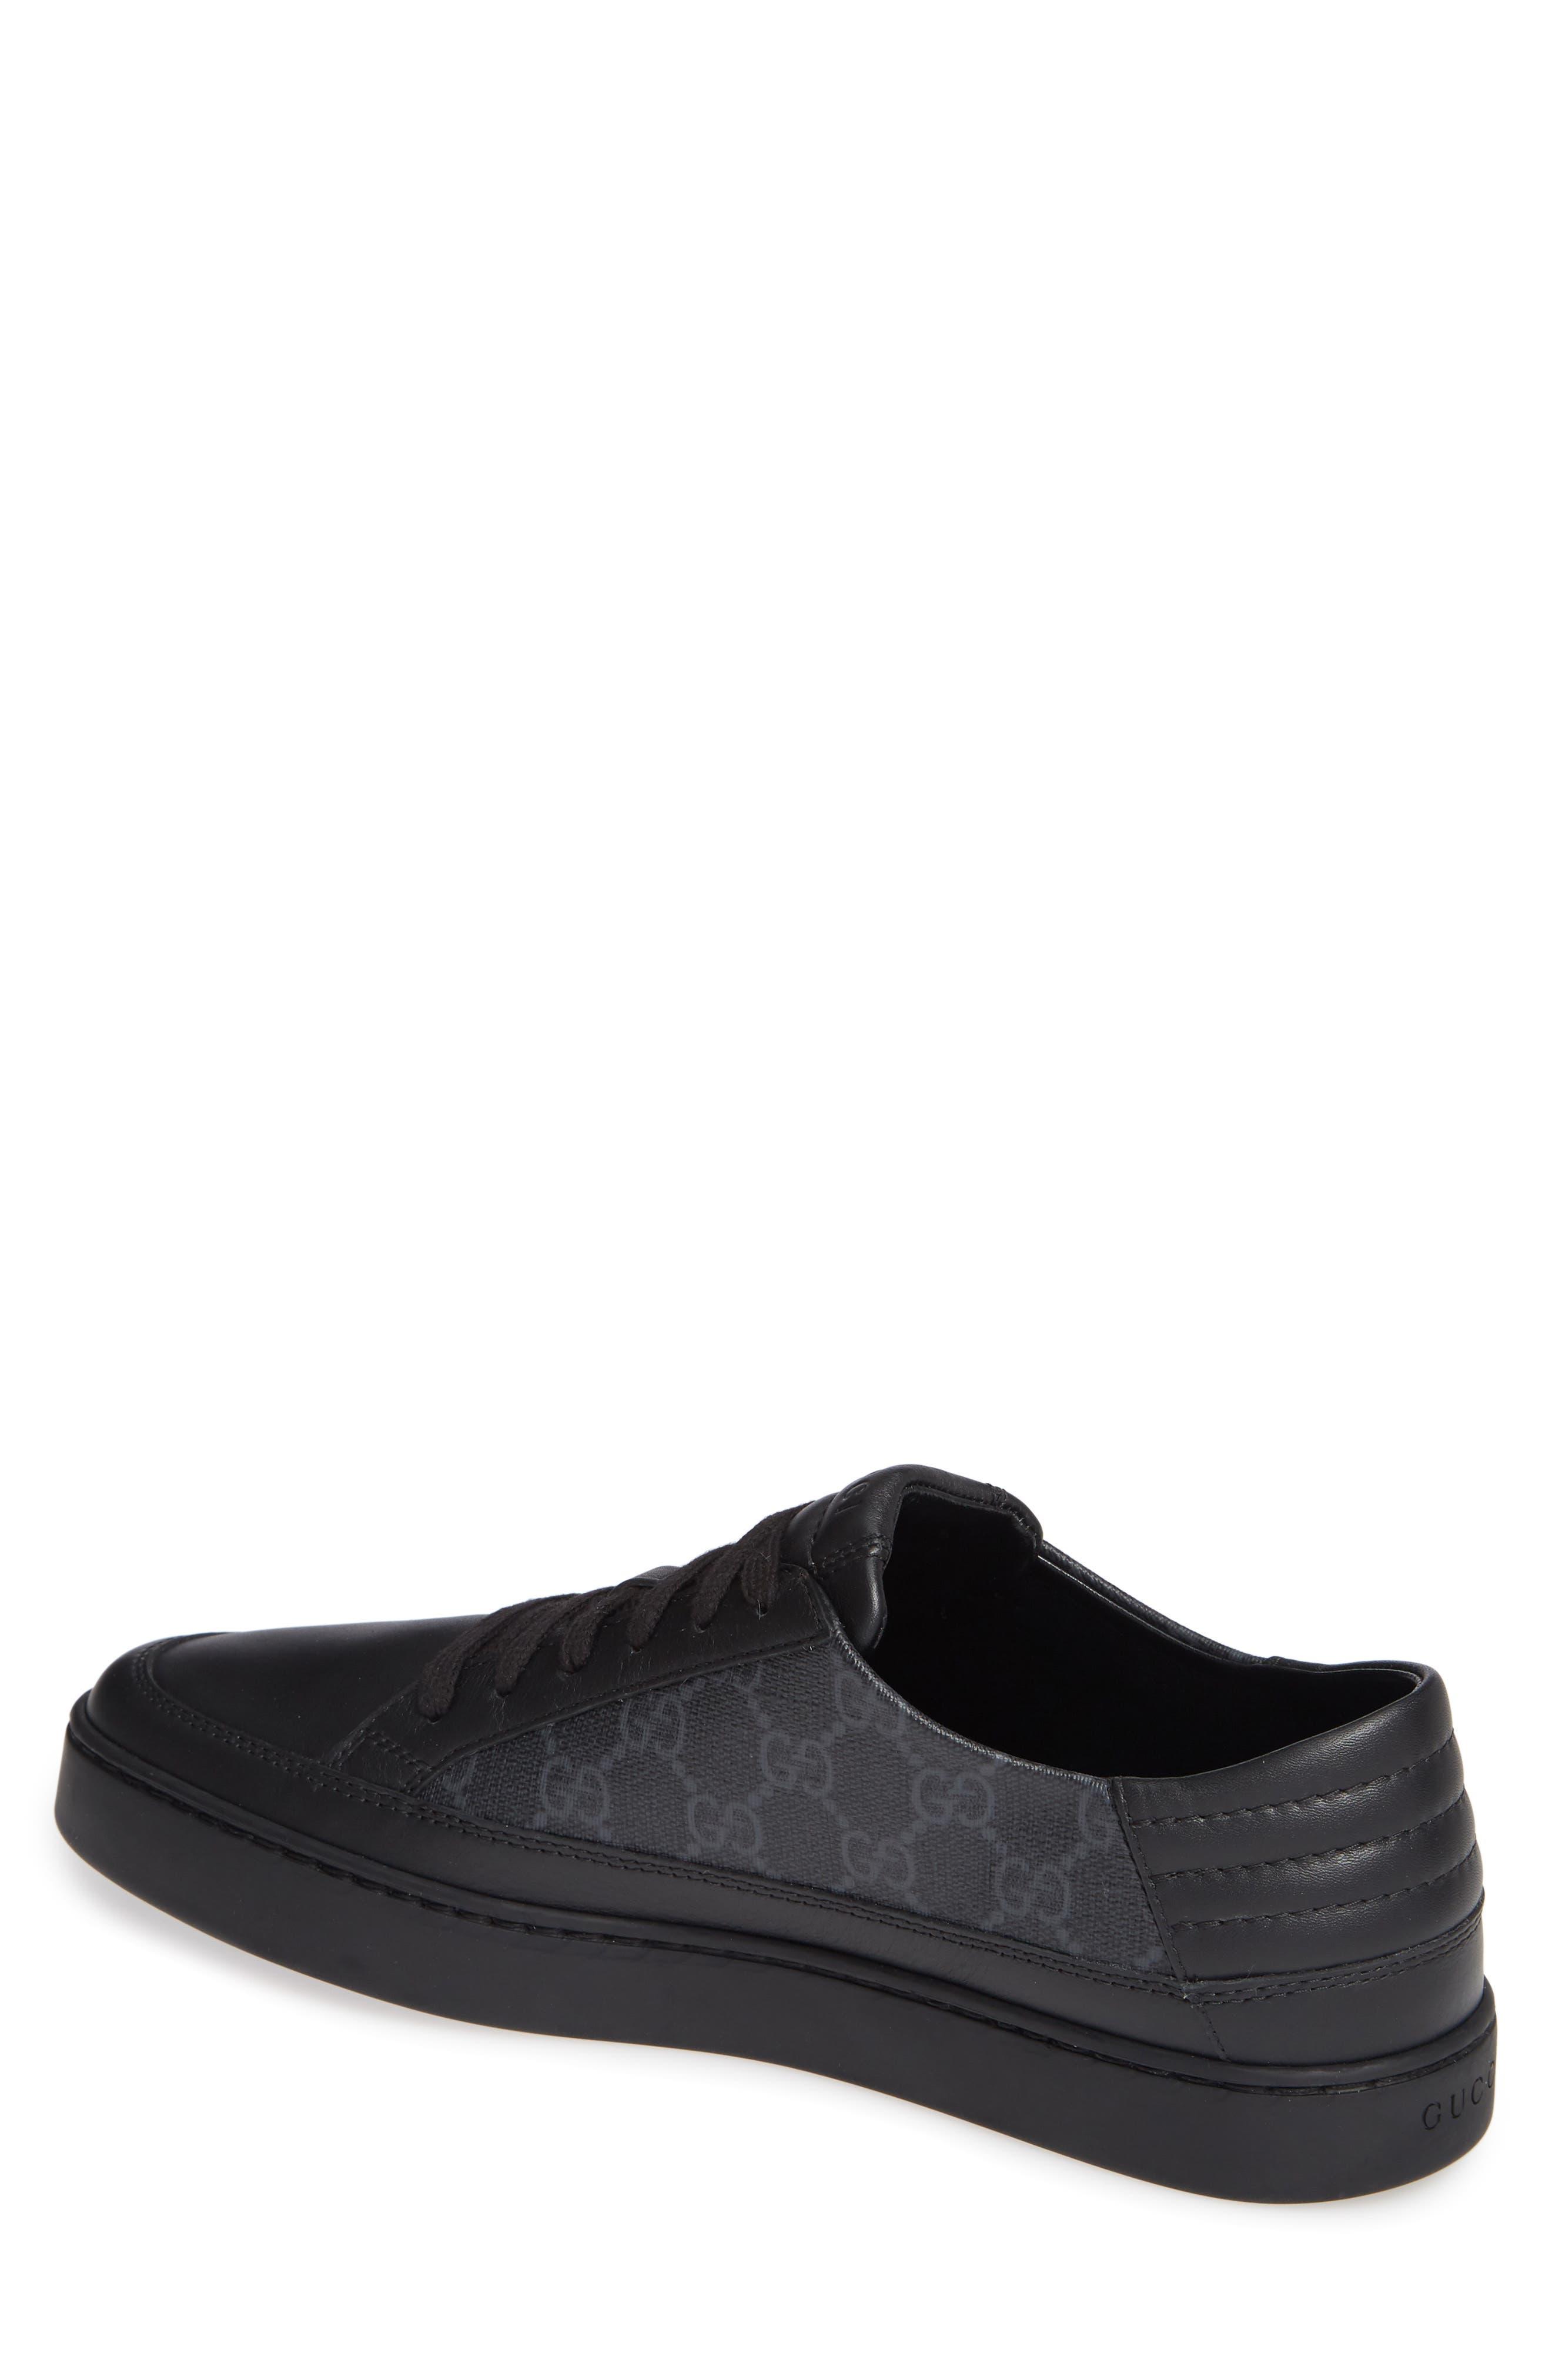 'Common' Low-Top Sneaker,                             Alternate thumbnail 2, color,                             NERO/ BLACK